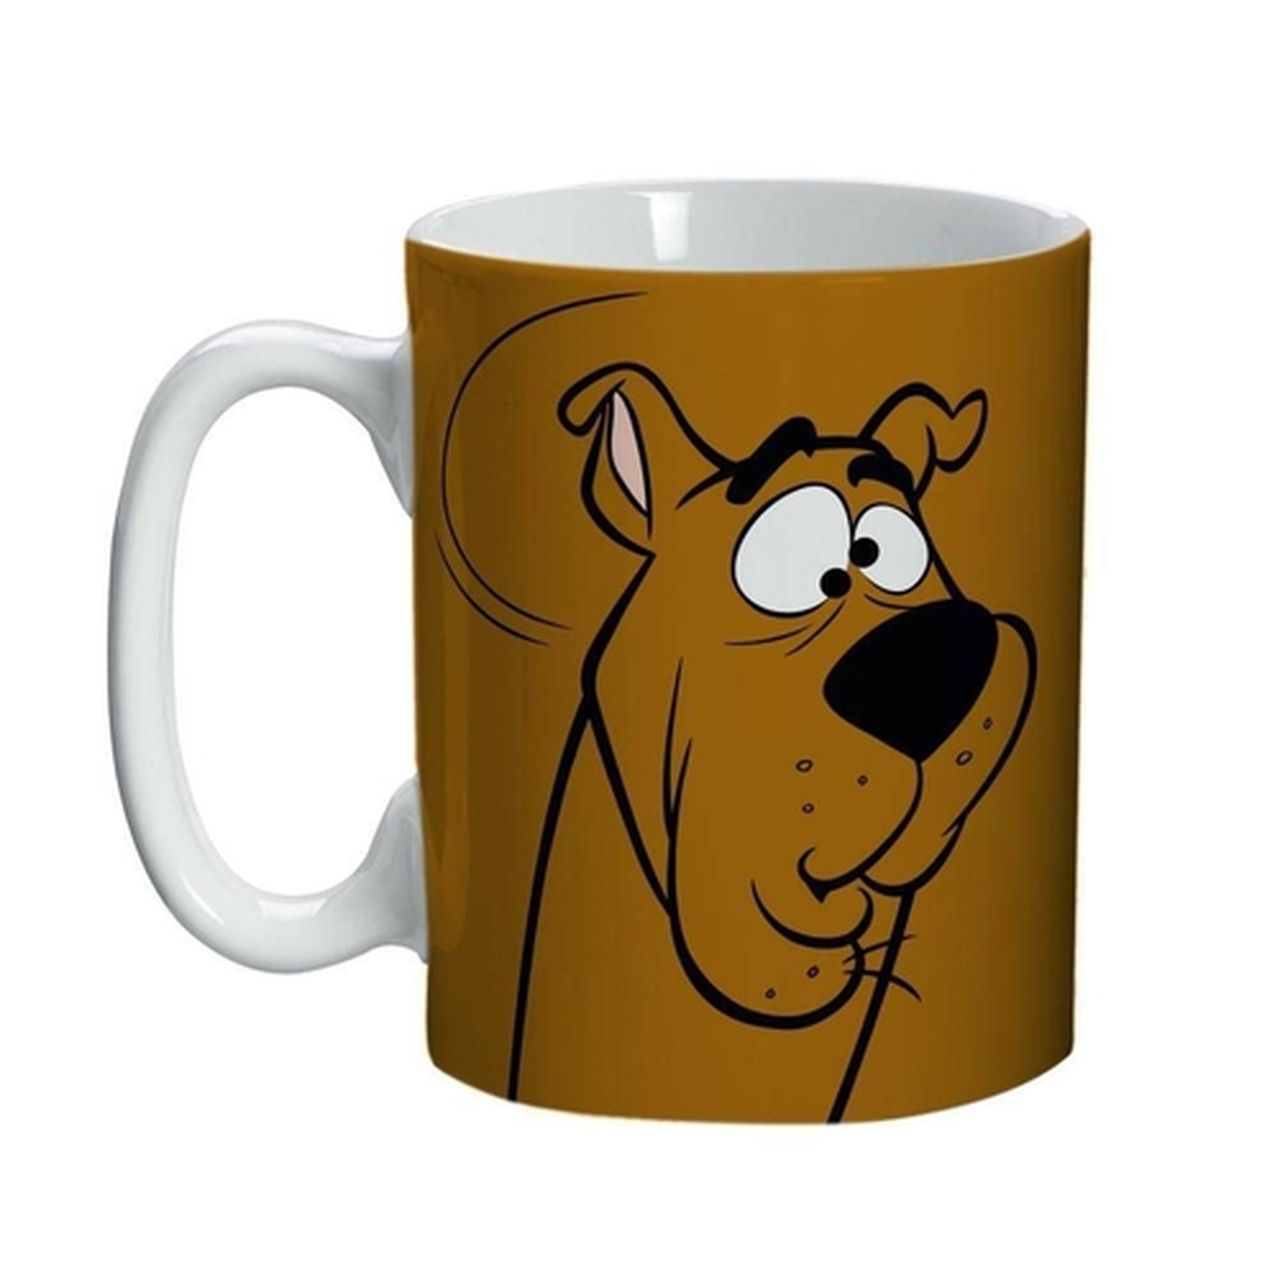 Mini Caneca de Porcelana Scooby-Doo: Scooby-Doo (135ml) - Metropole